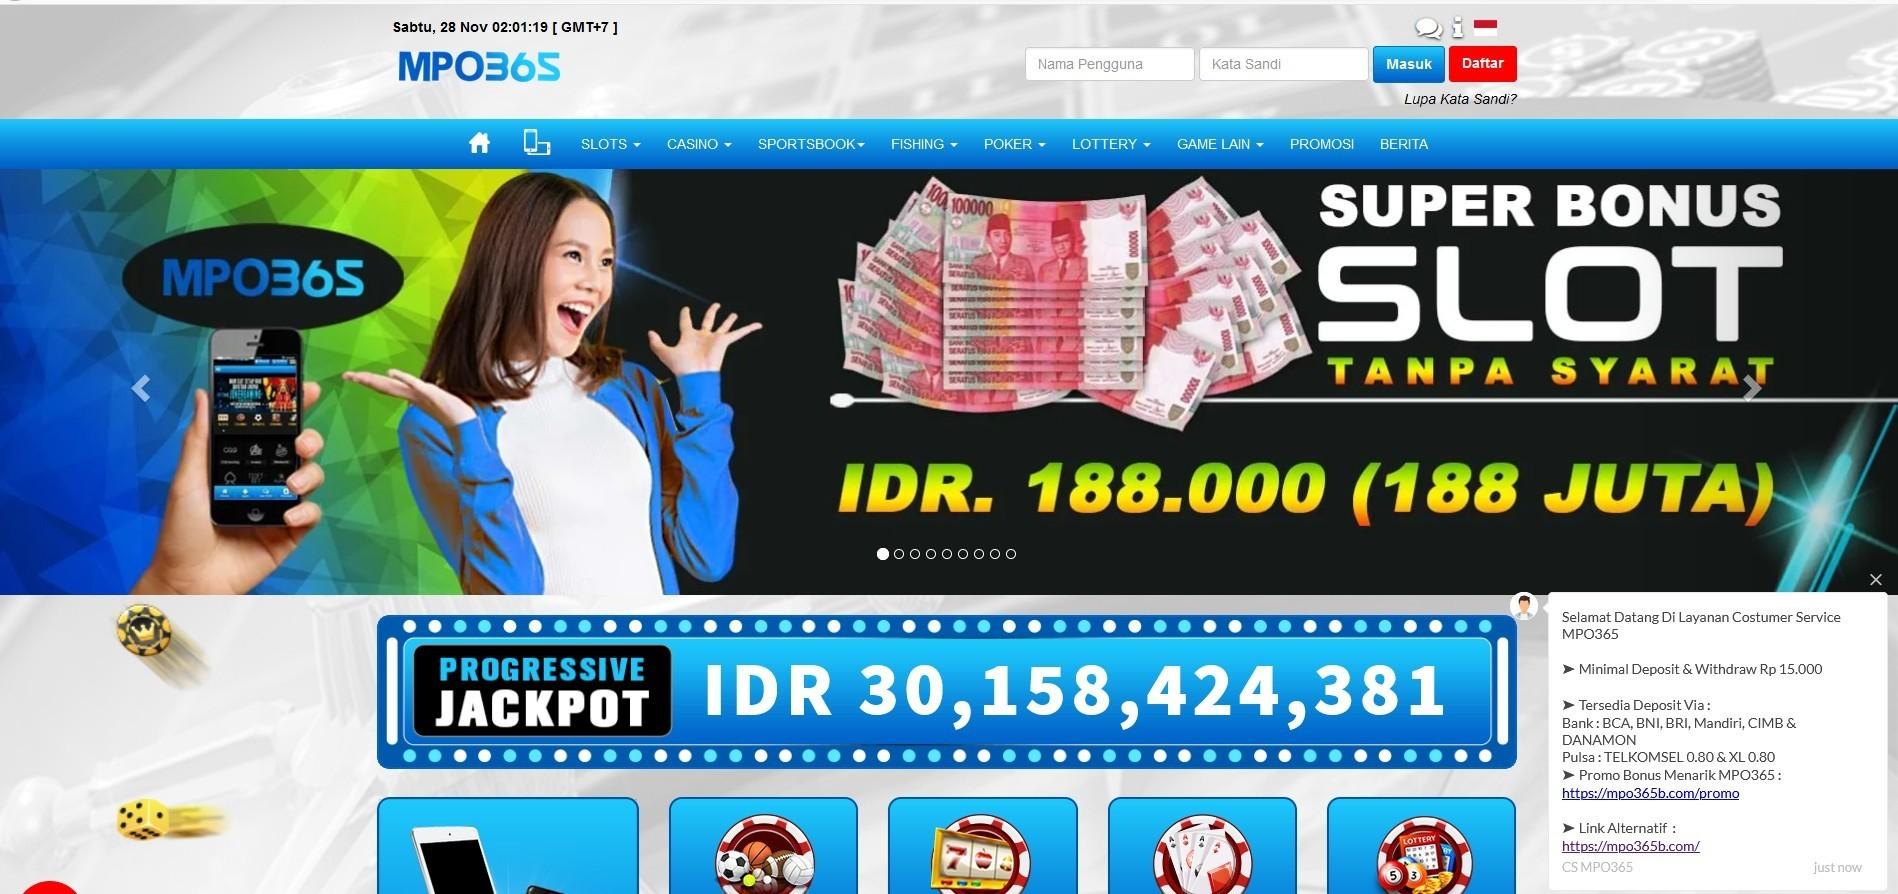 Jual Tiket Mpo365 Situs Slots Online Deposit Pulsa Axis Tanpa Potongan Loket Com